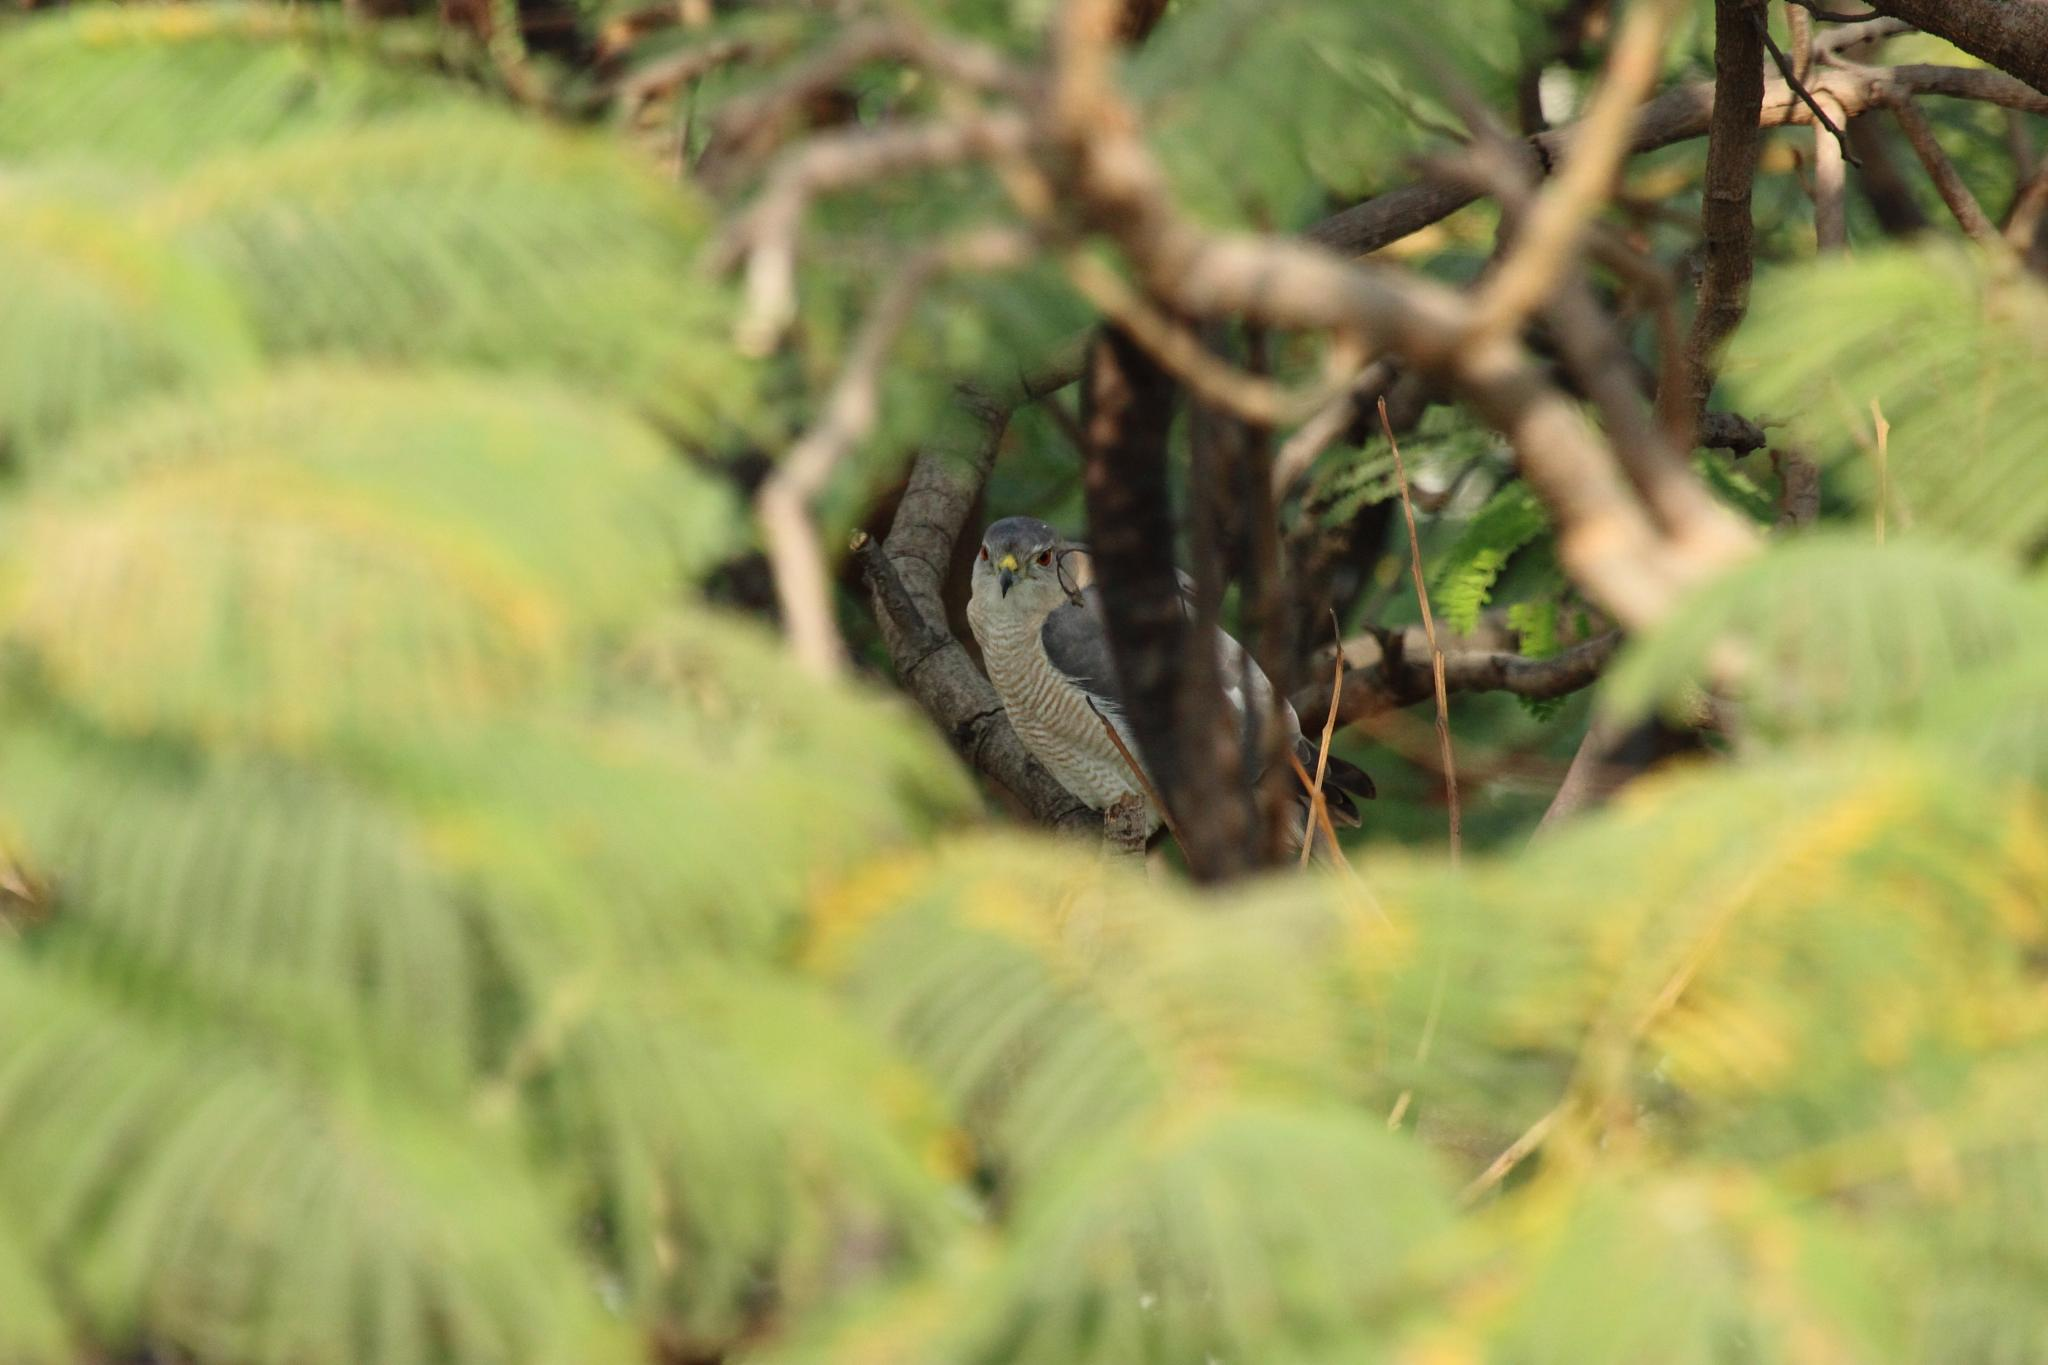 Shikra, Falcon in Natural Habitat by Nirav Mehta